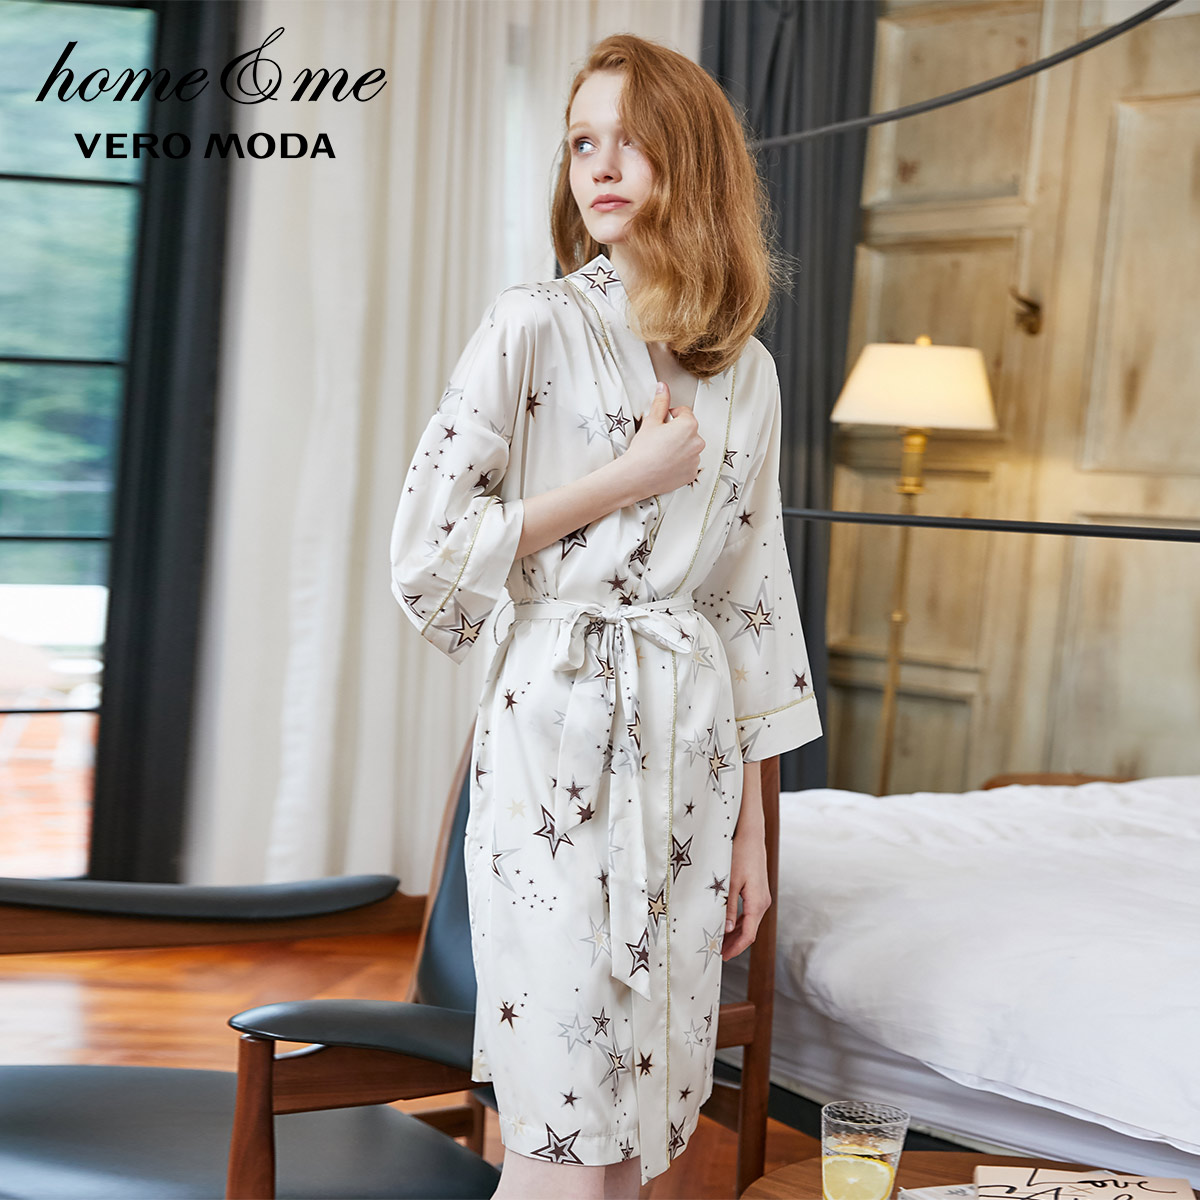 Vero Moda New Women's Star Print 3/4 Drop-shoulder Sleeves Silky Night Robe | 3193R1502